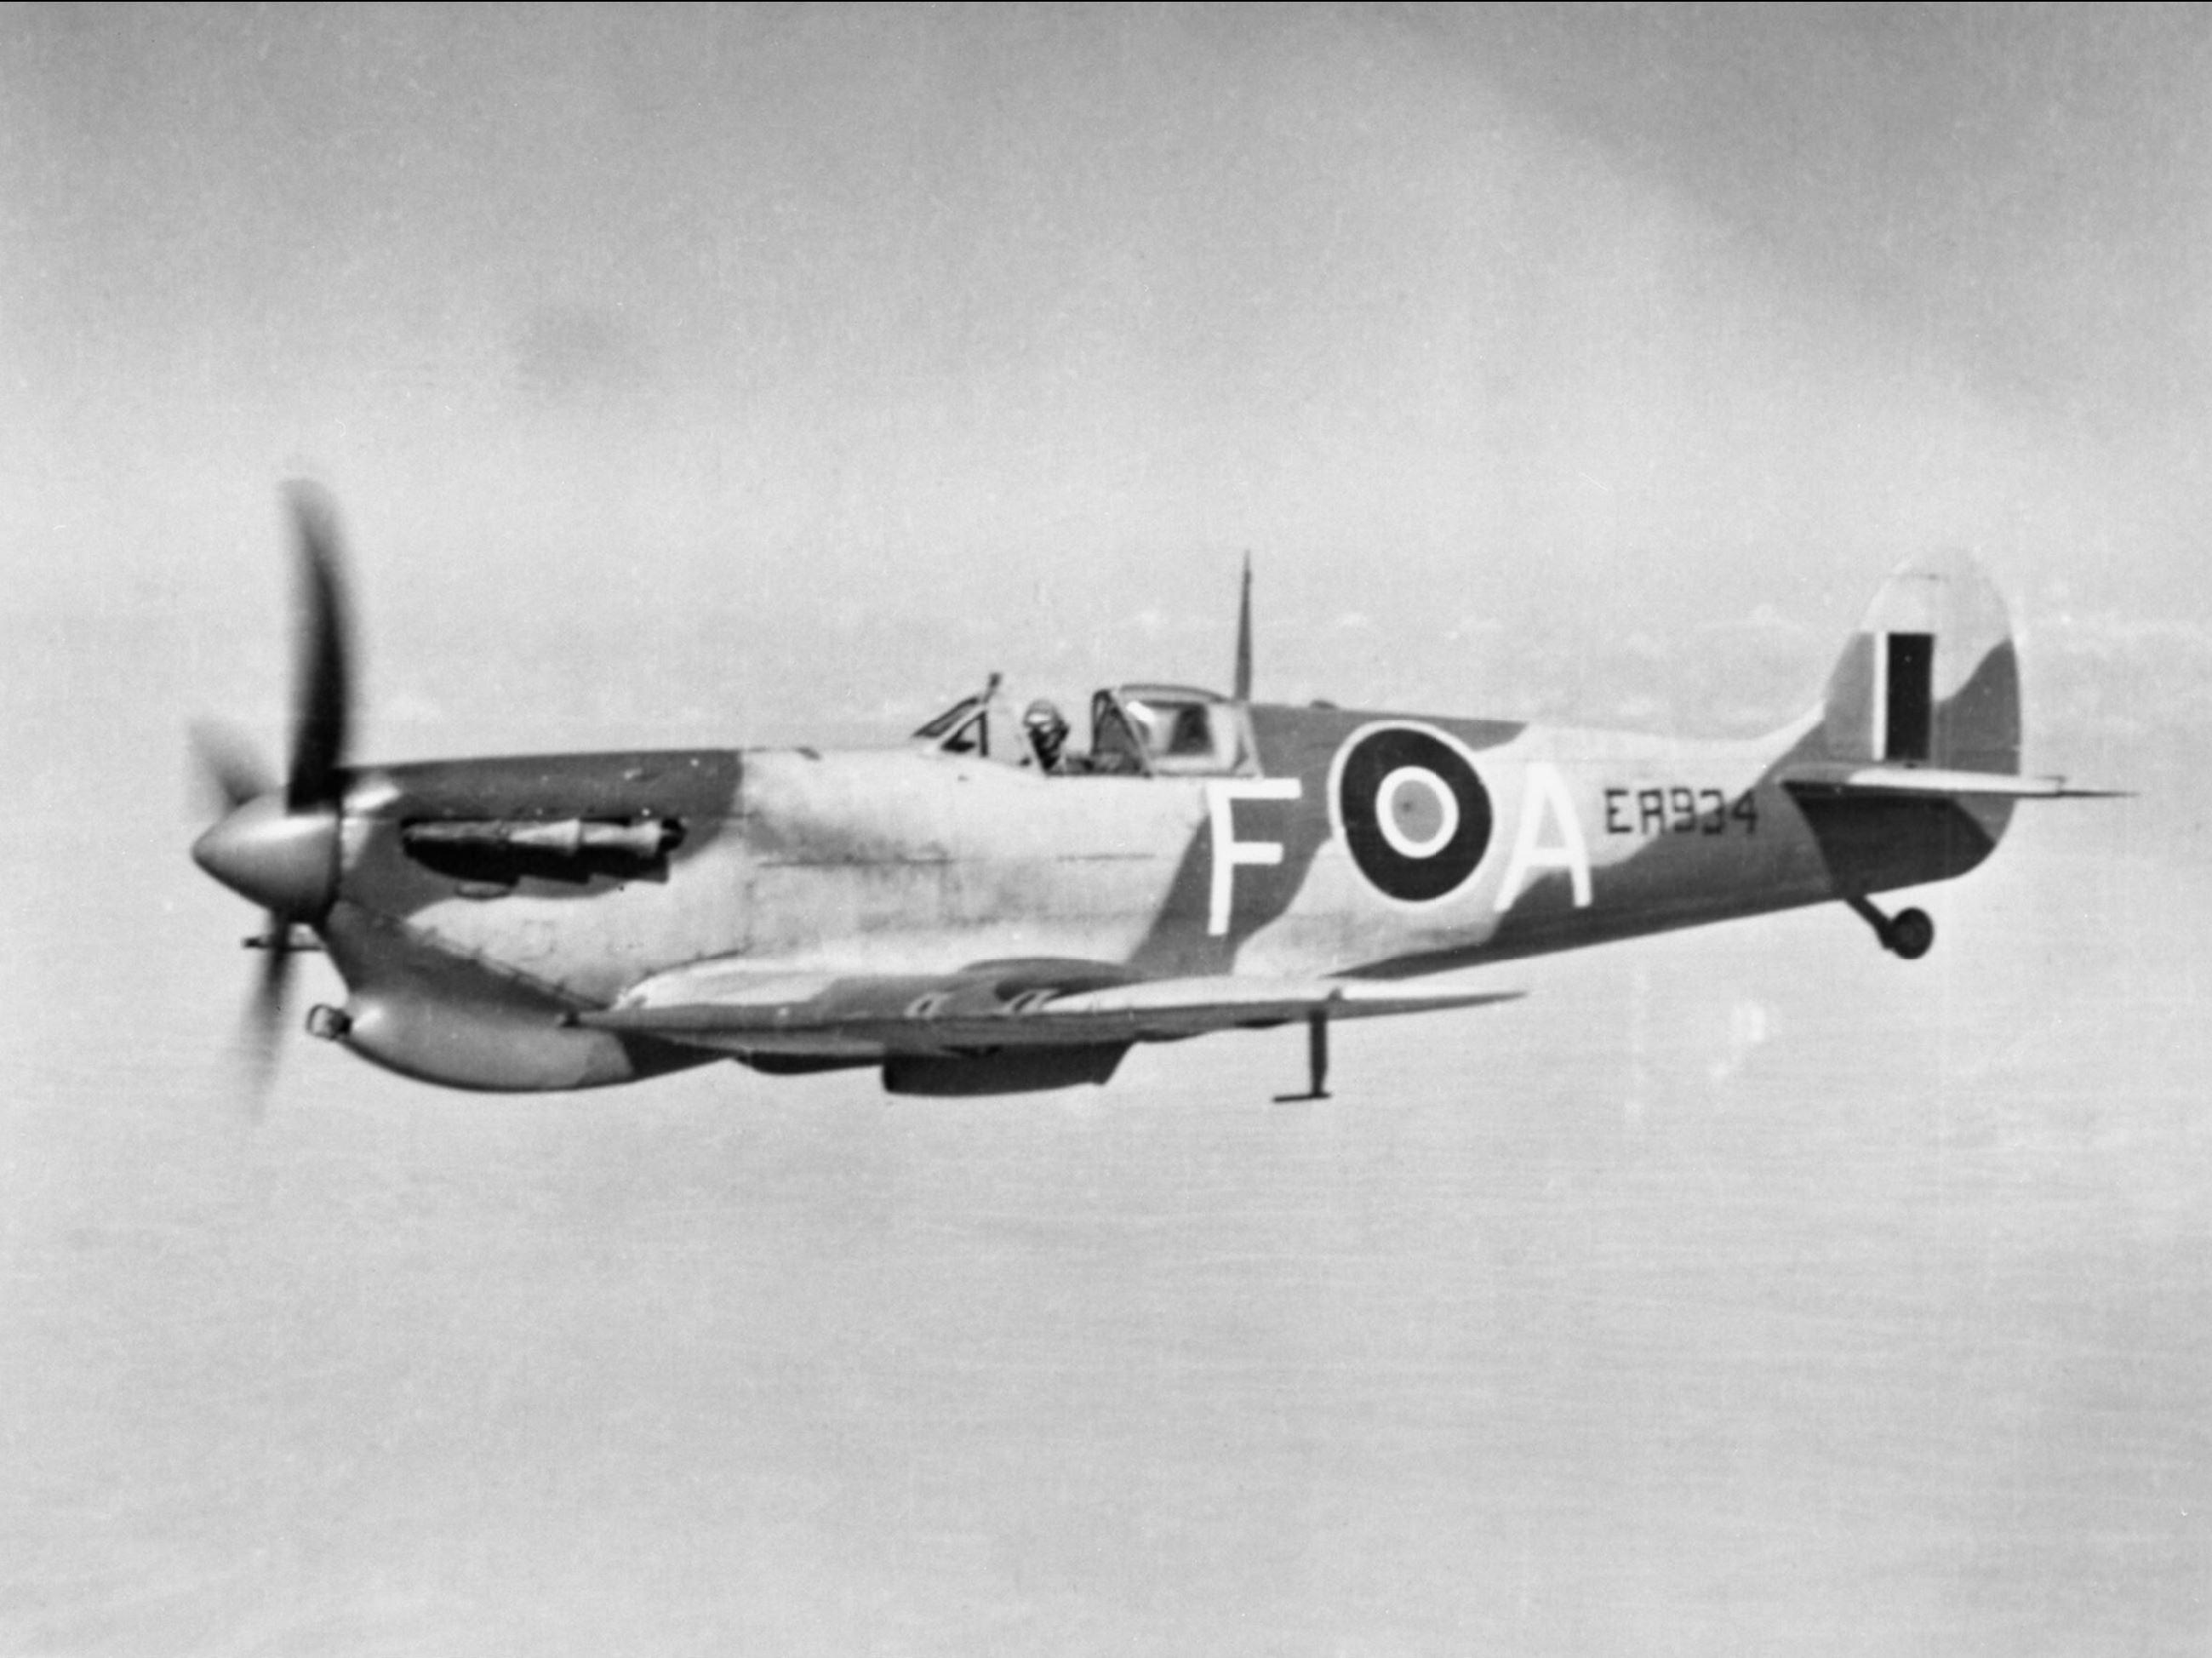 Spitfire Vc RAF FA ER934 over Egypt transfering to SAAF 73OTU IWM HU73185